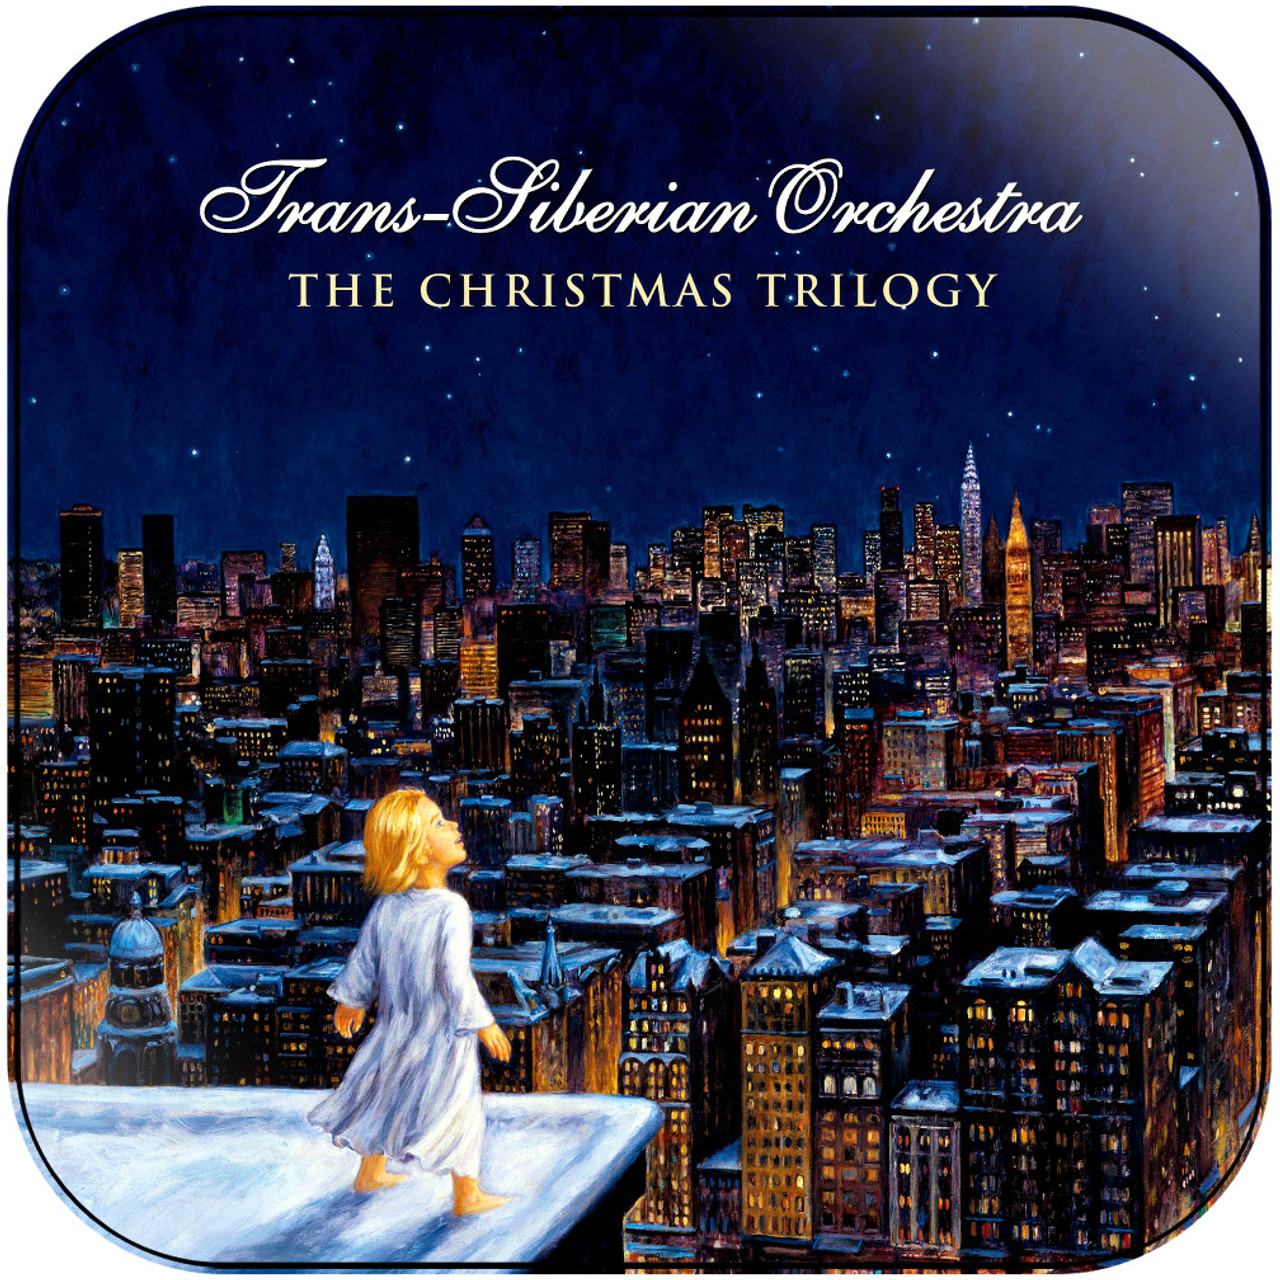 Trans Siberian Christmas.Trans Siberian Orchestra The Christmas Trilogy Album Cover Sticker